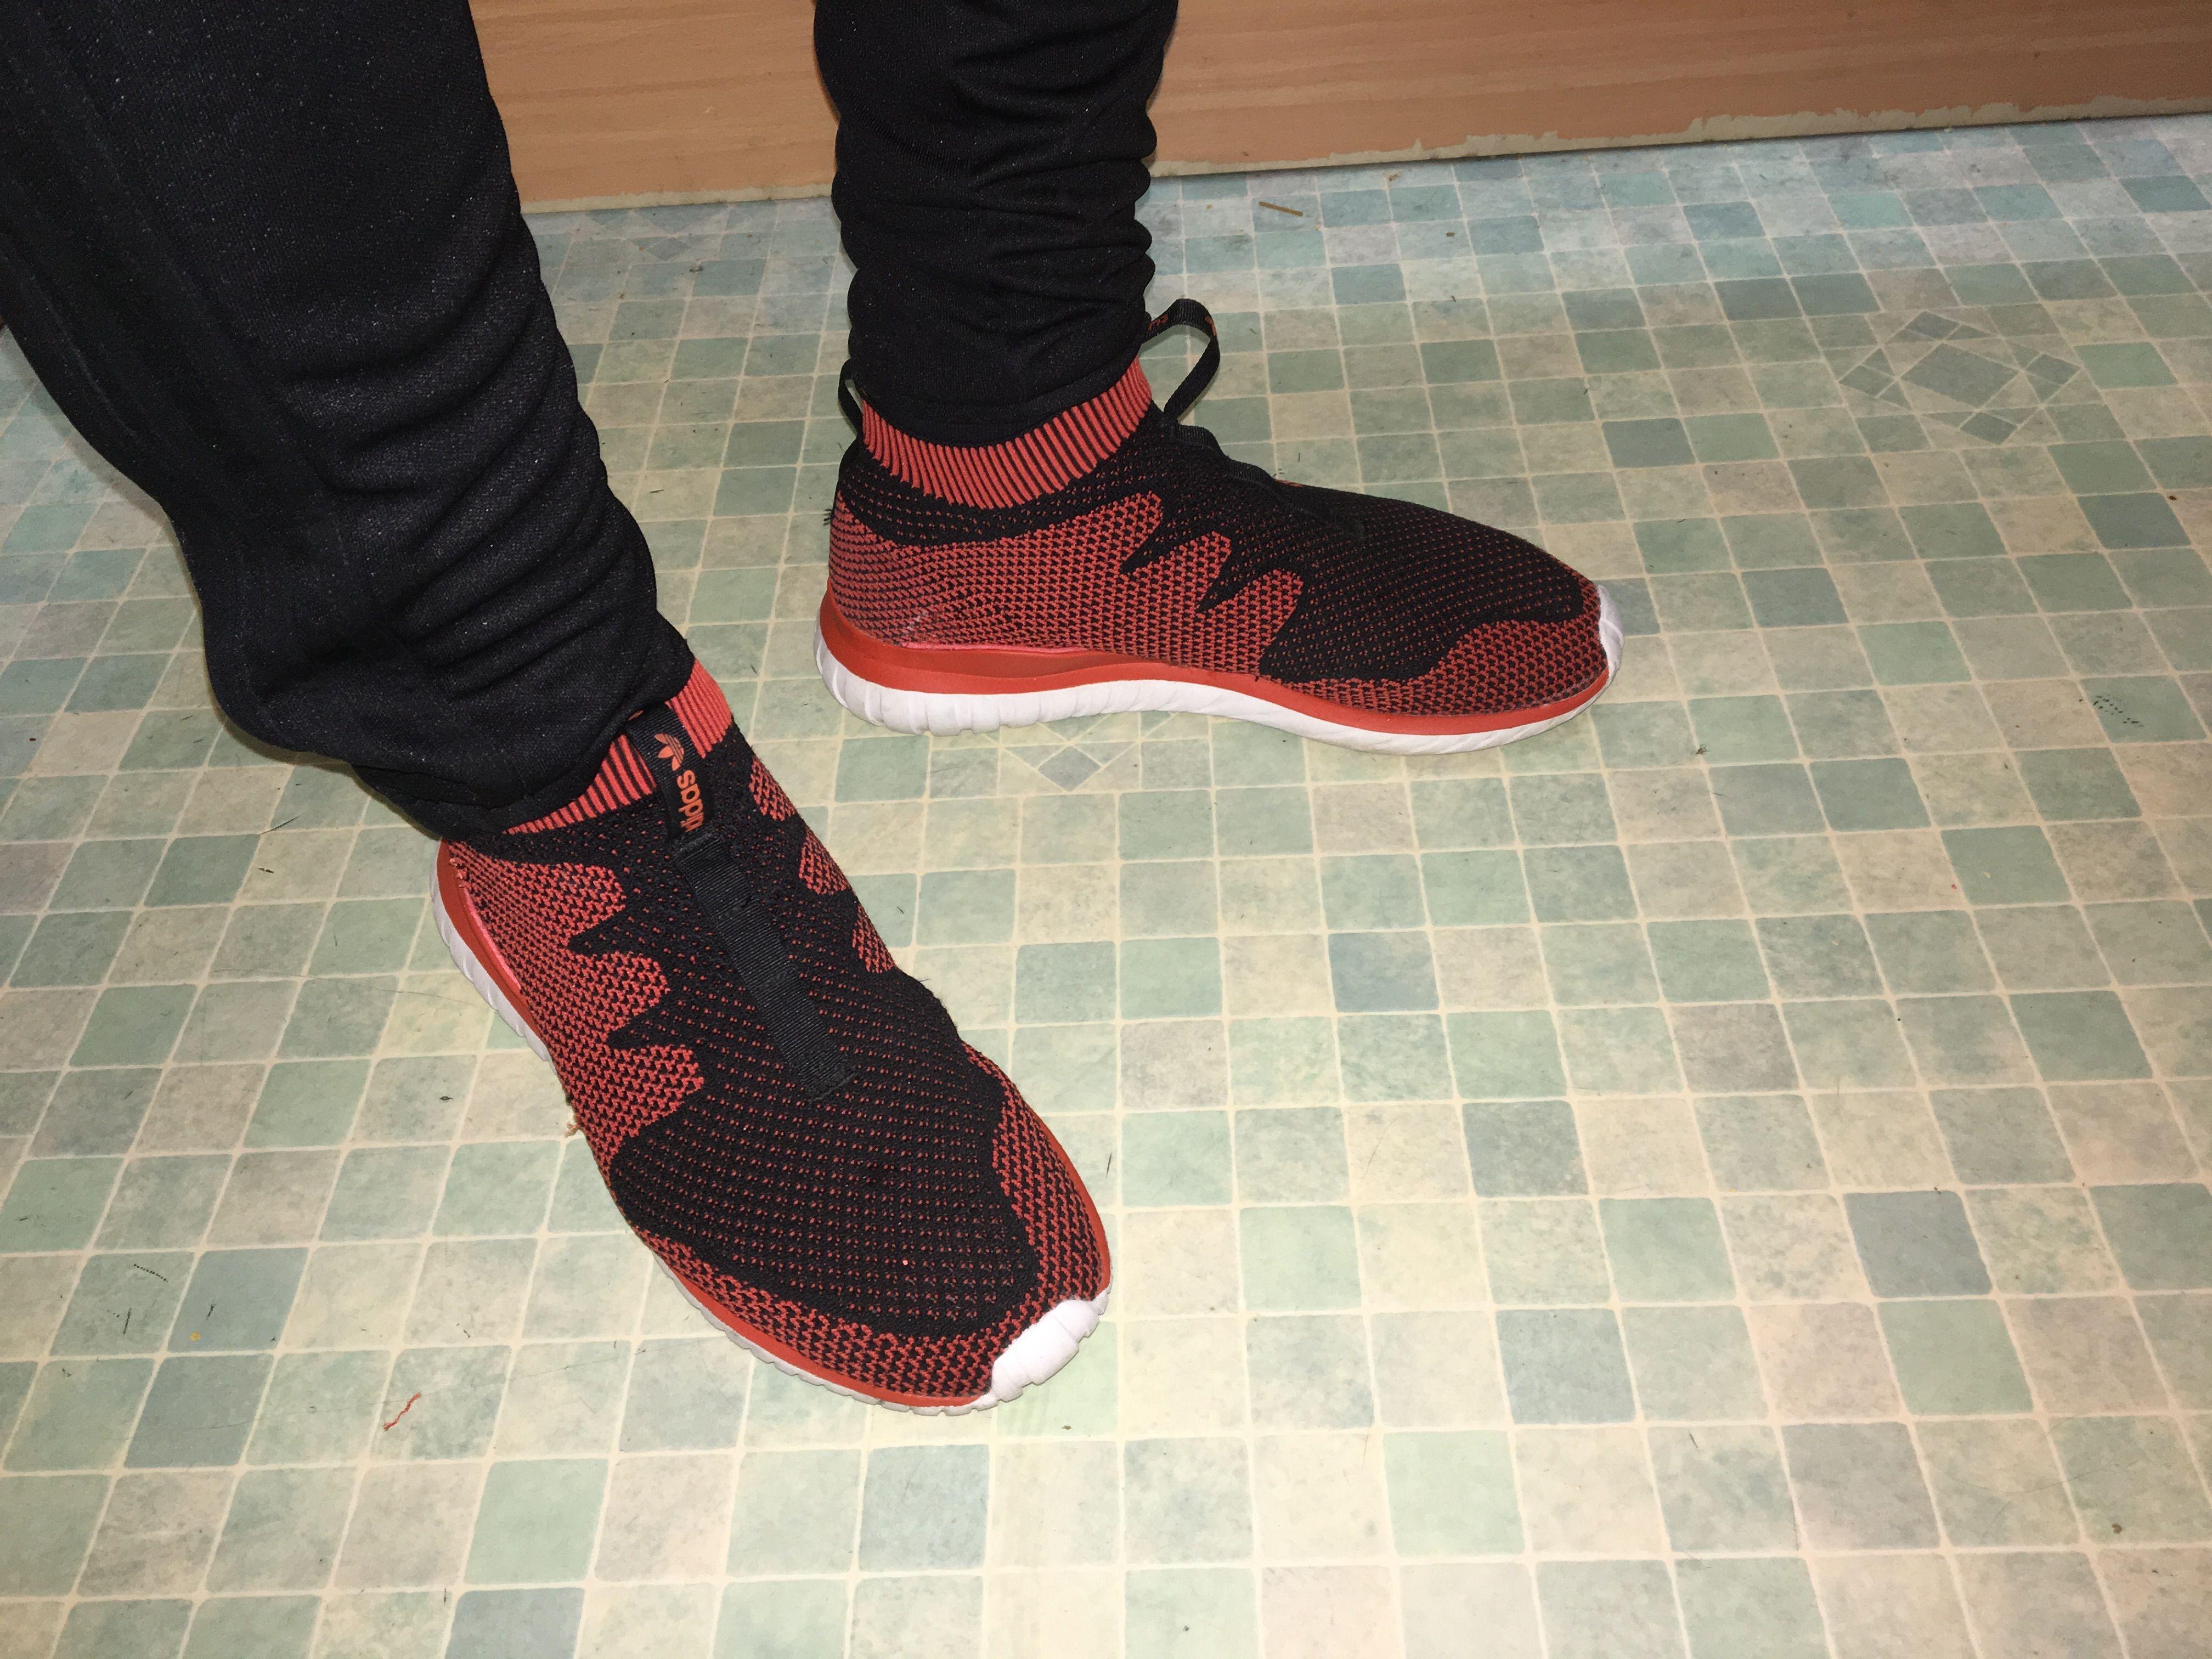 new style a7fed 6dfef Adidas tubular nova primeknit uncaged custom | sneakers ...